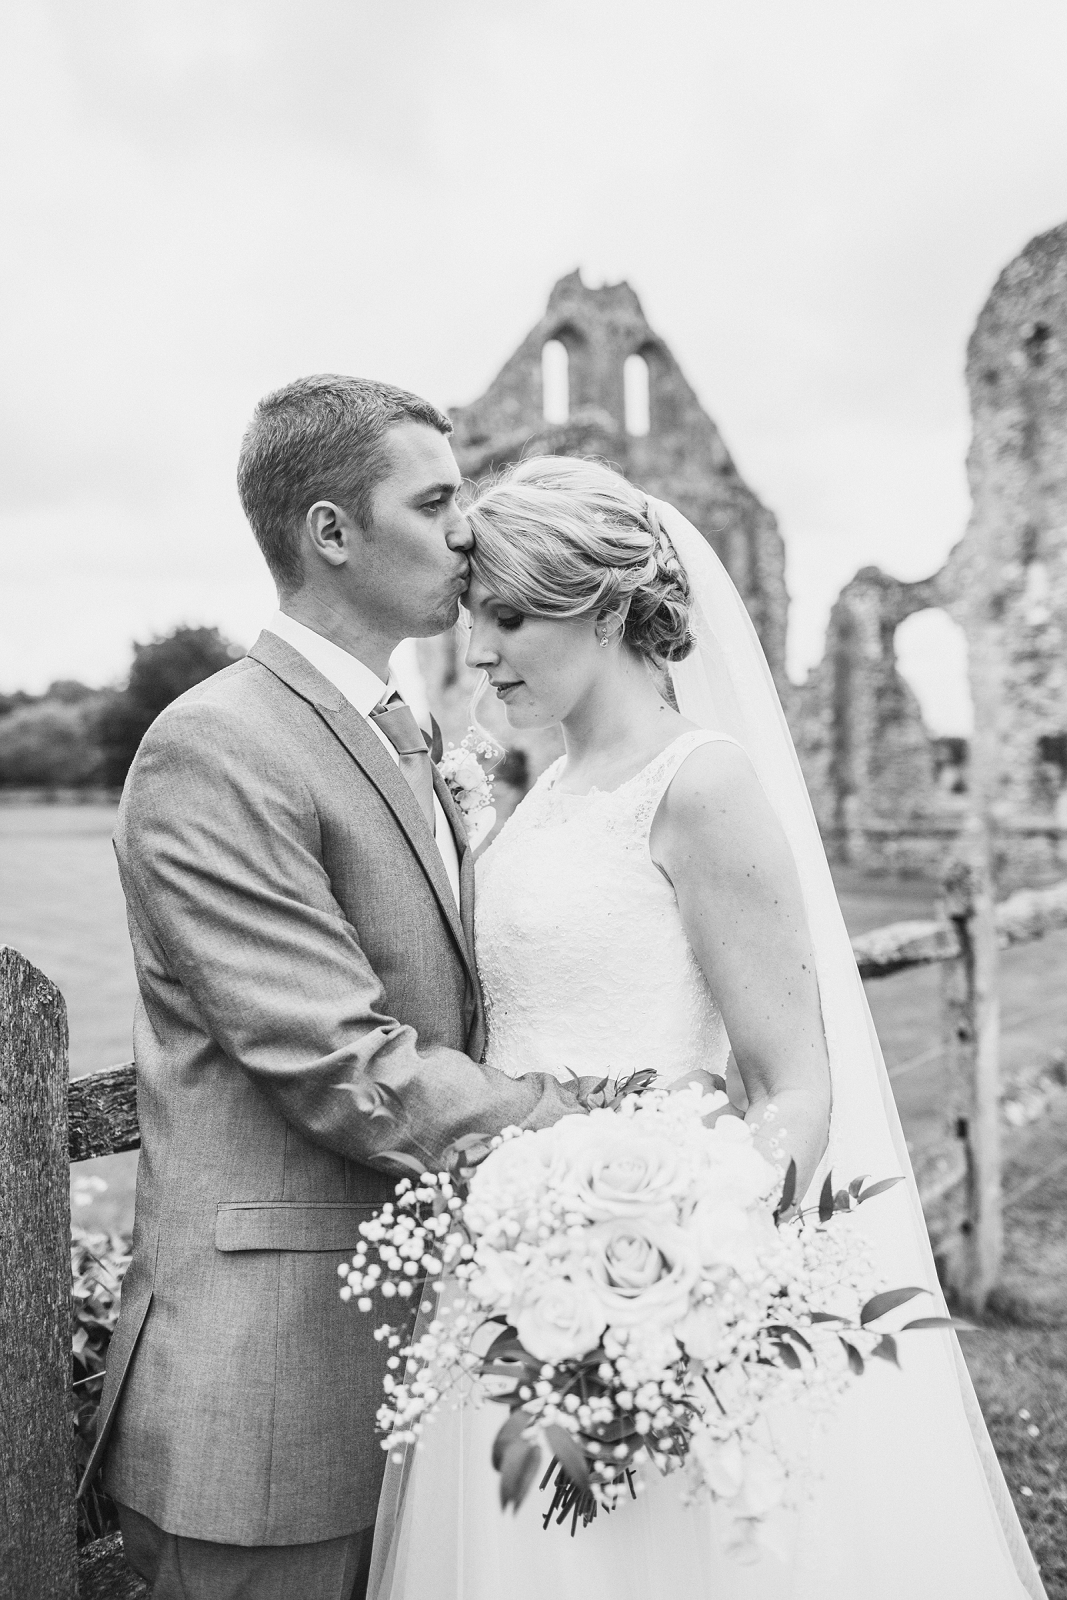 Sheralyn and Shane's wedding - Nicki Feltham Photography